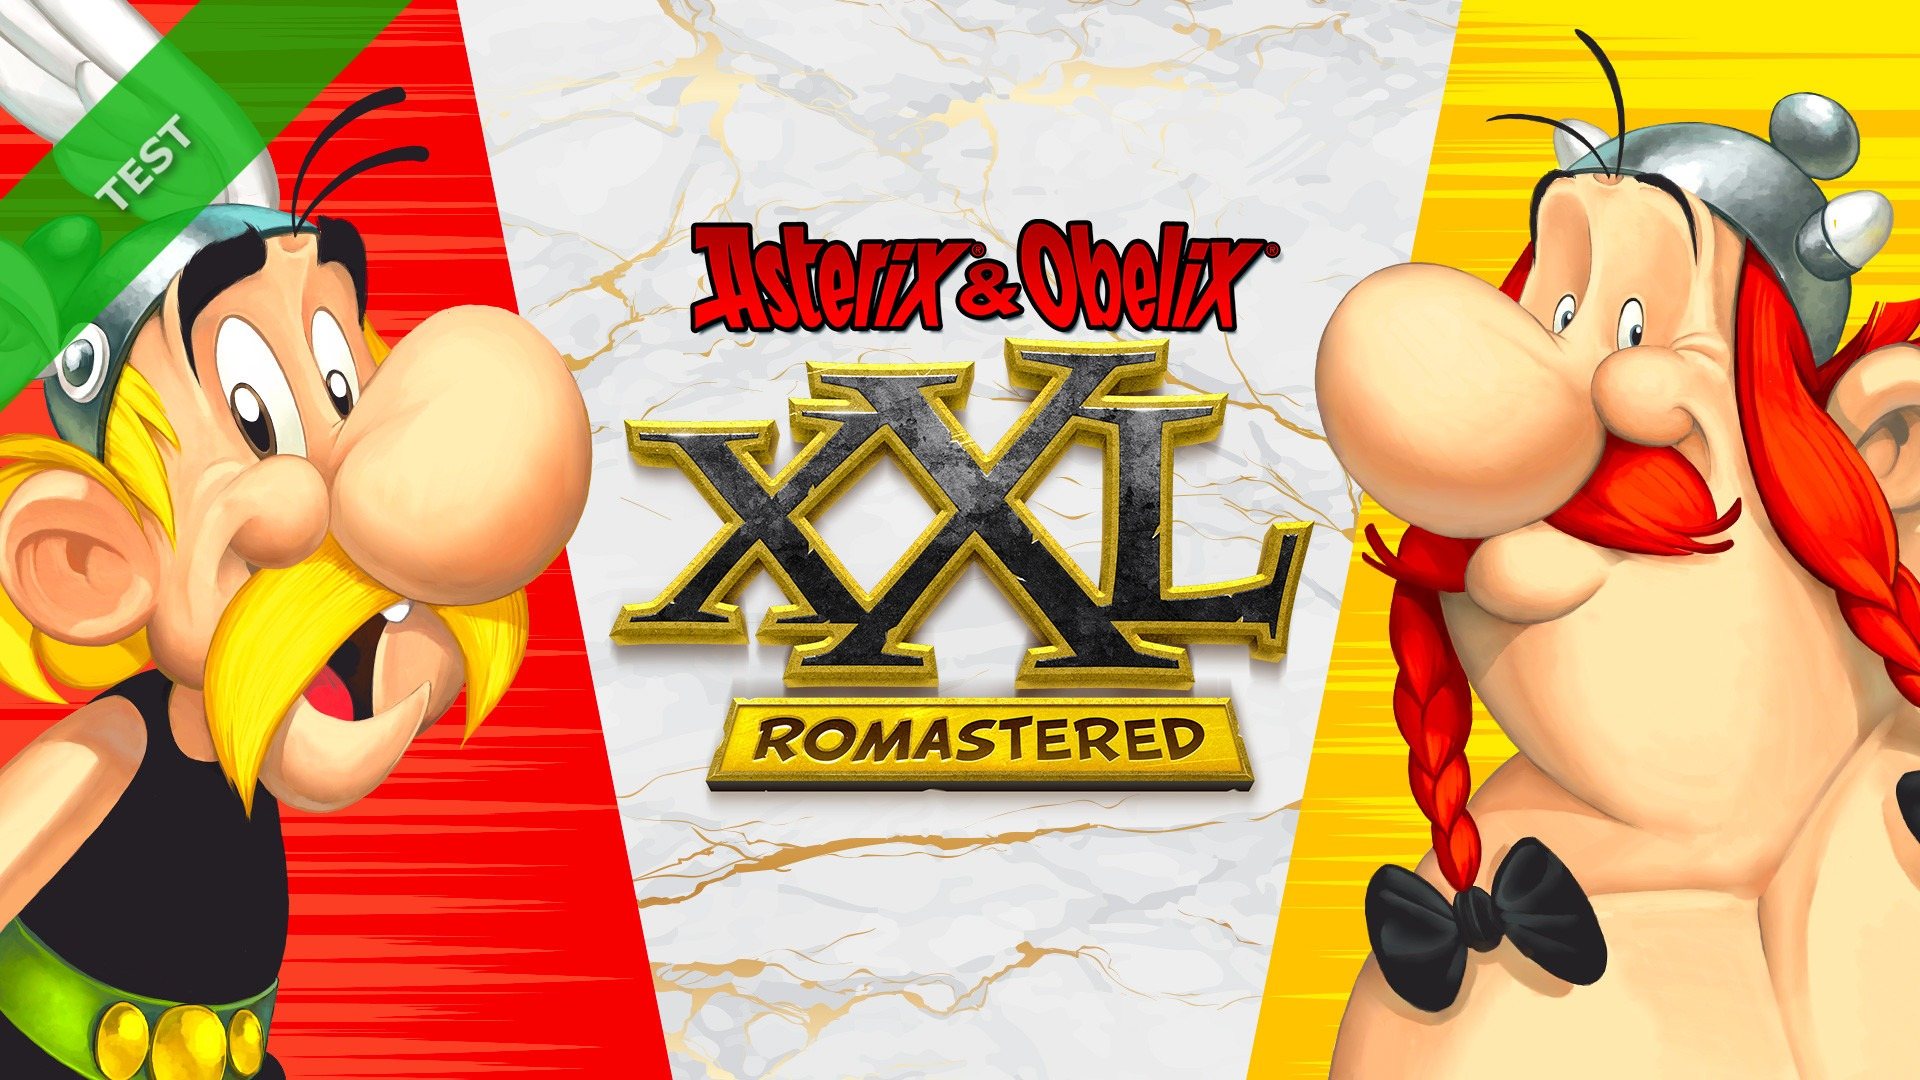 TEST Asterix & Obelix XXL Romastered XWFR